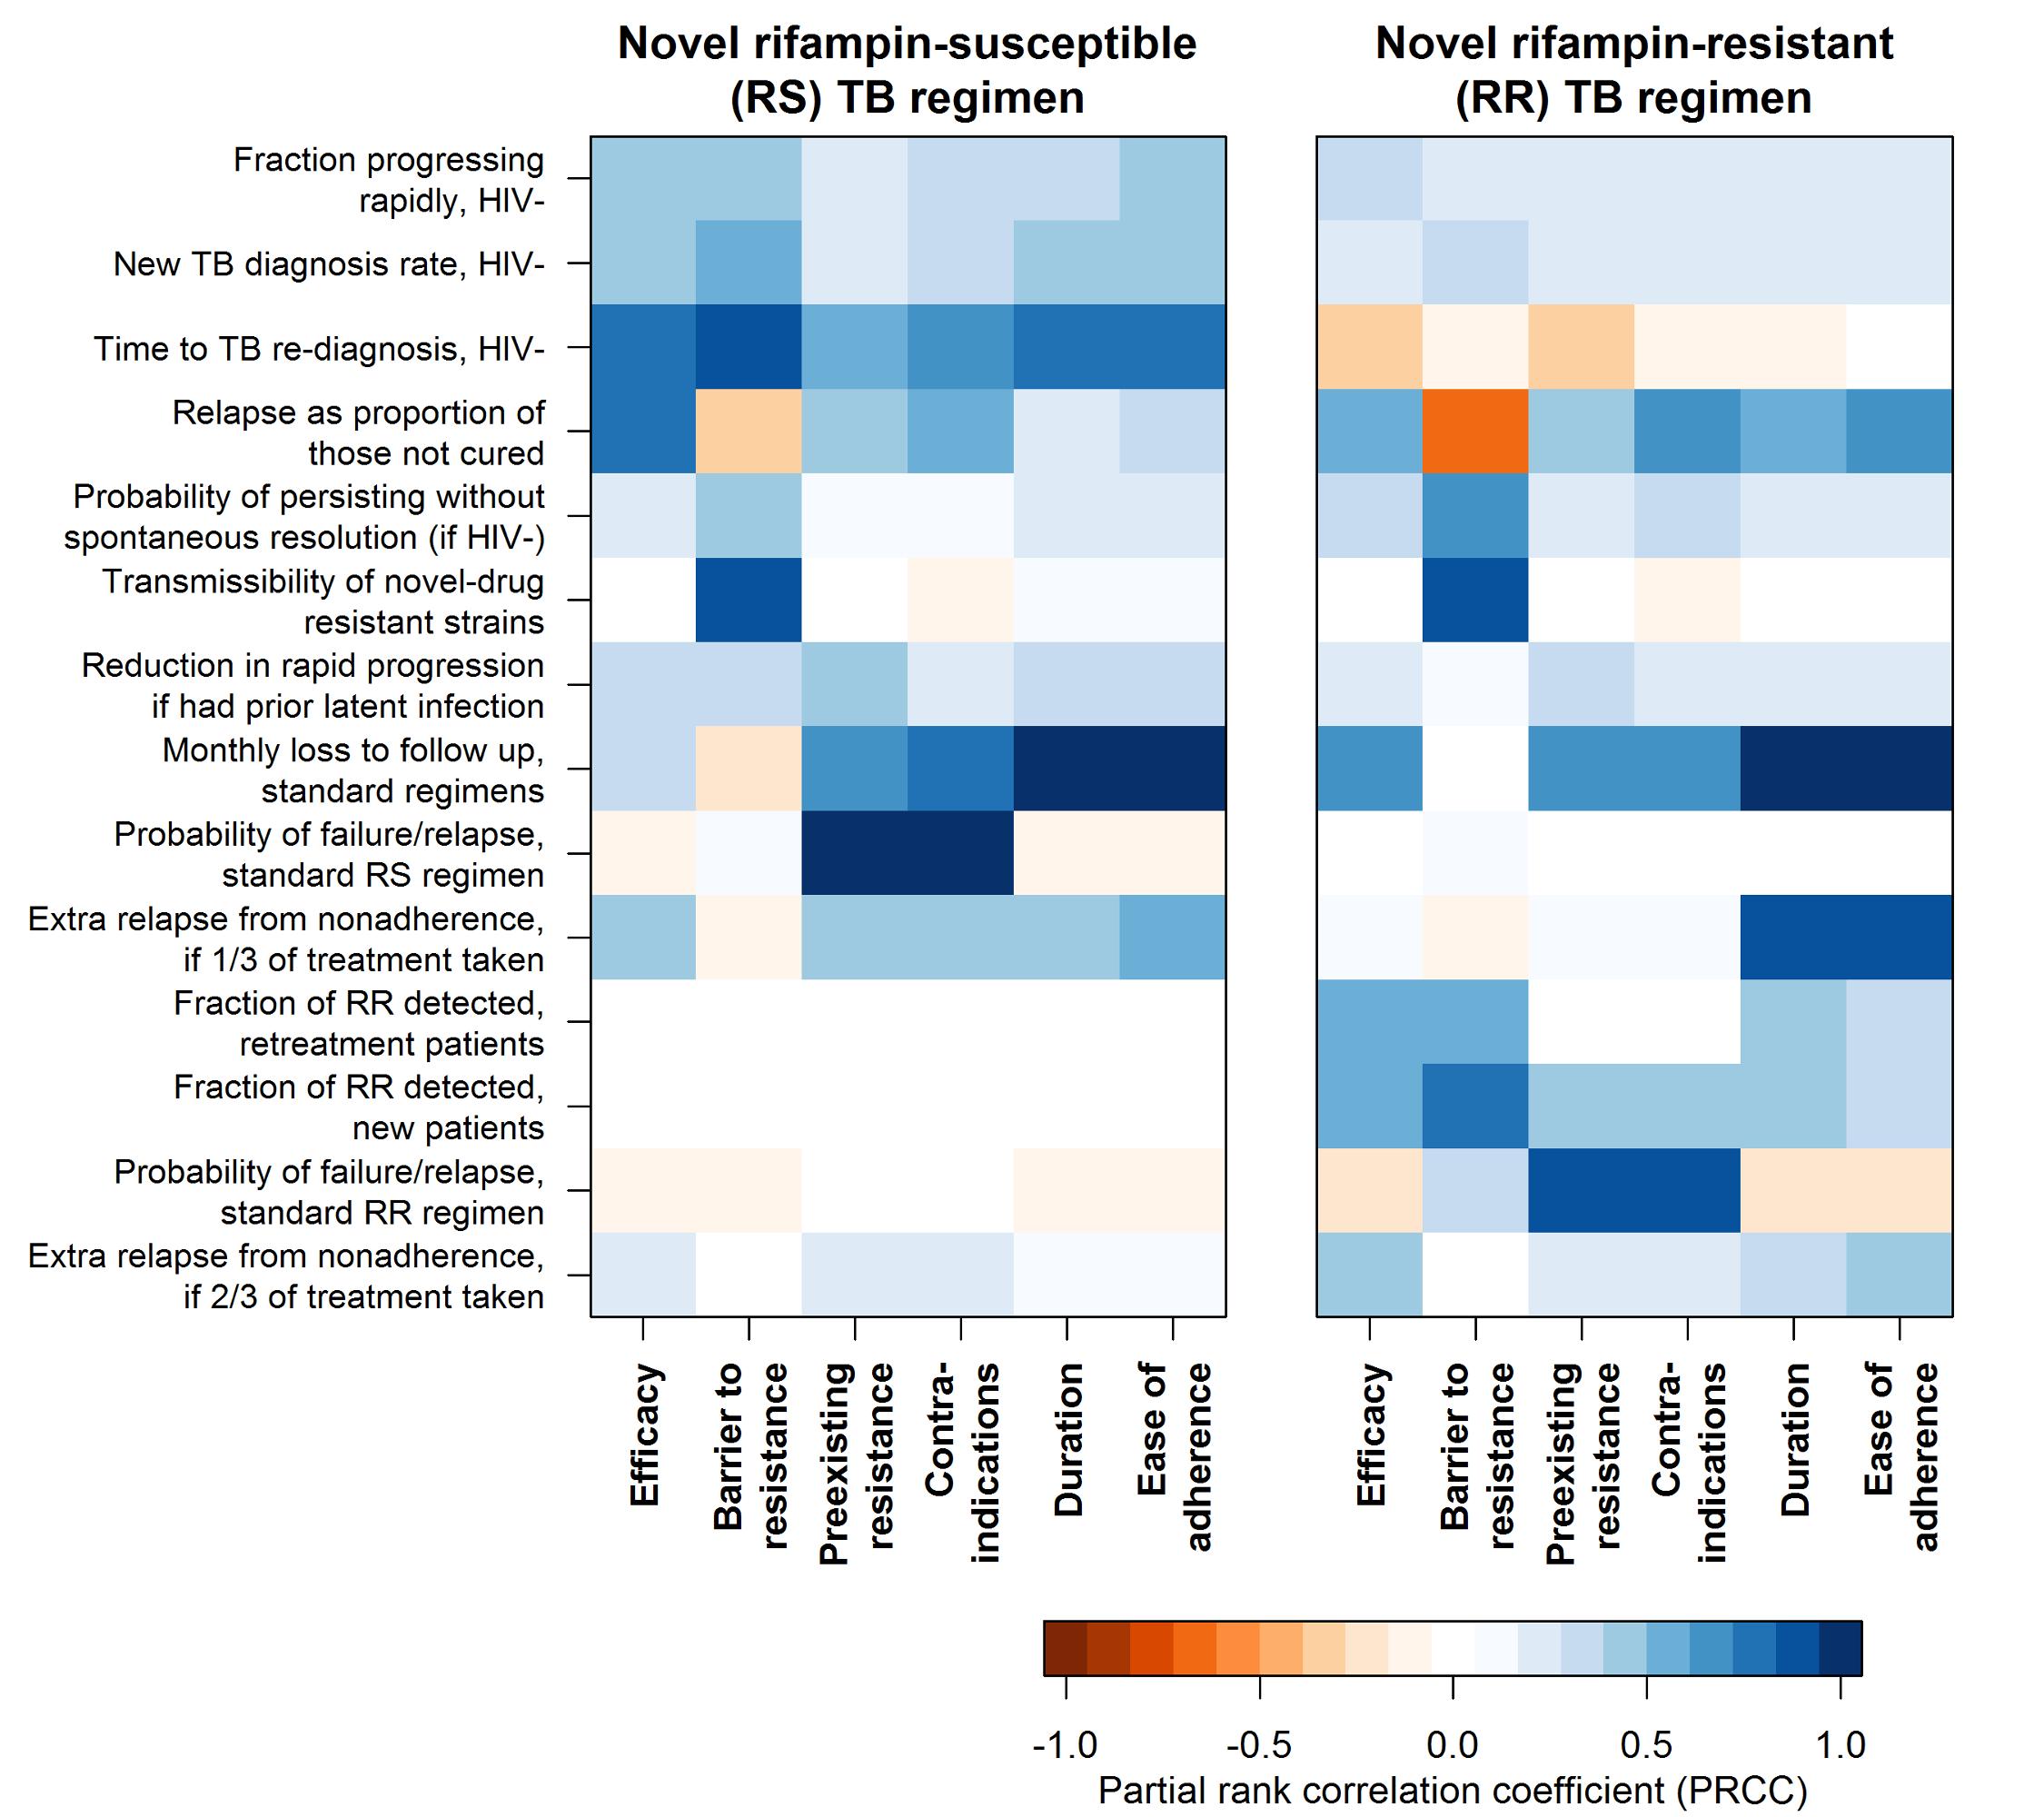 Sensitivity of the impact of individual regimen characteristics to values of model parameters.